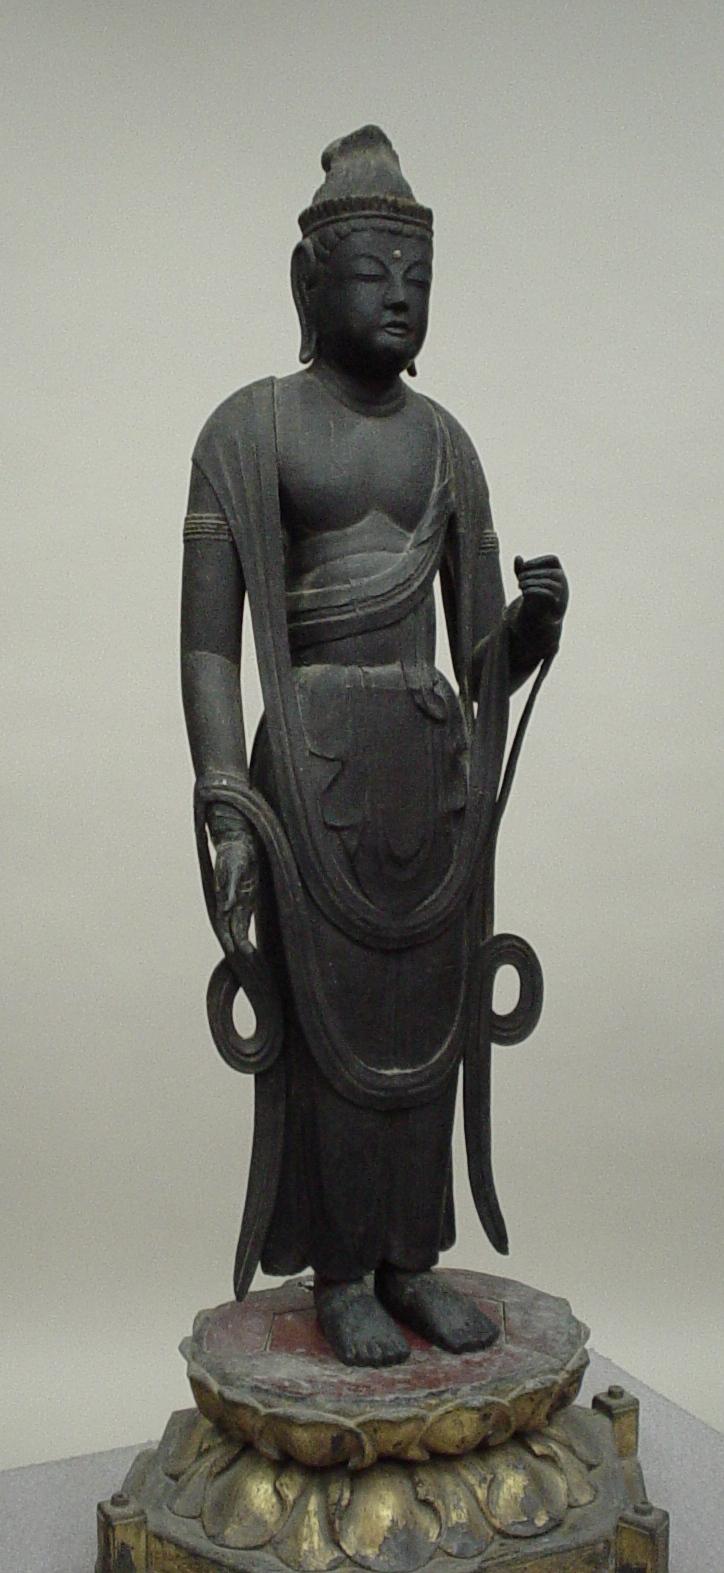 観音菩薩立像 福井県指定文化財 誓願寺蔵 平安末期。港湾都市小浜の成立年代を示す仏像です。